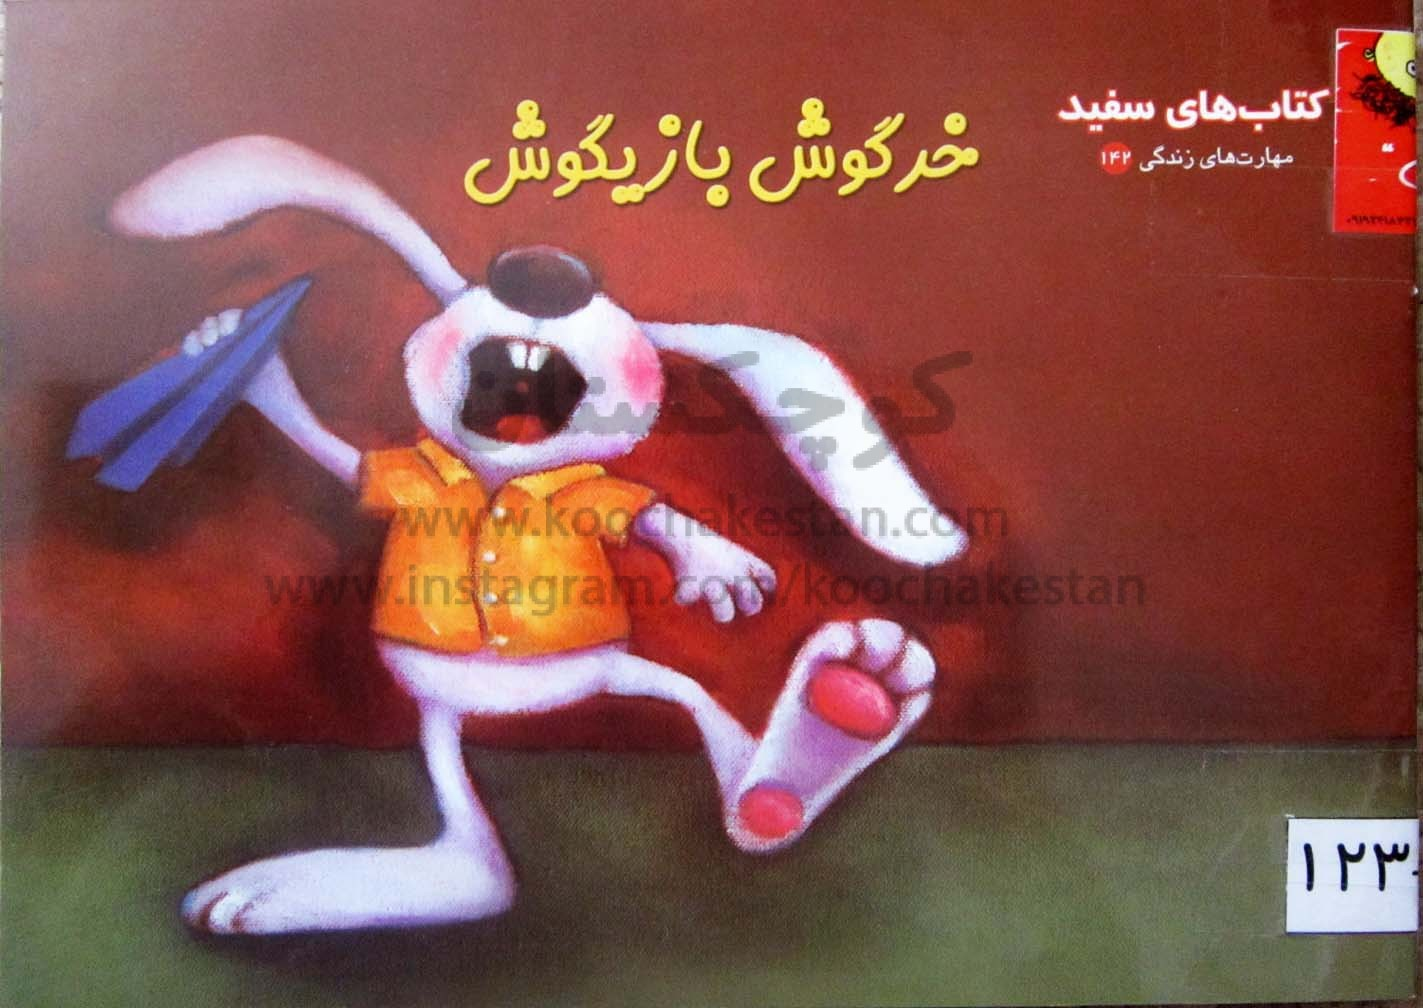 خرگوش بازیگوش - کتابخانه کودک - کوچکستان